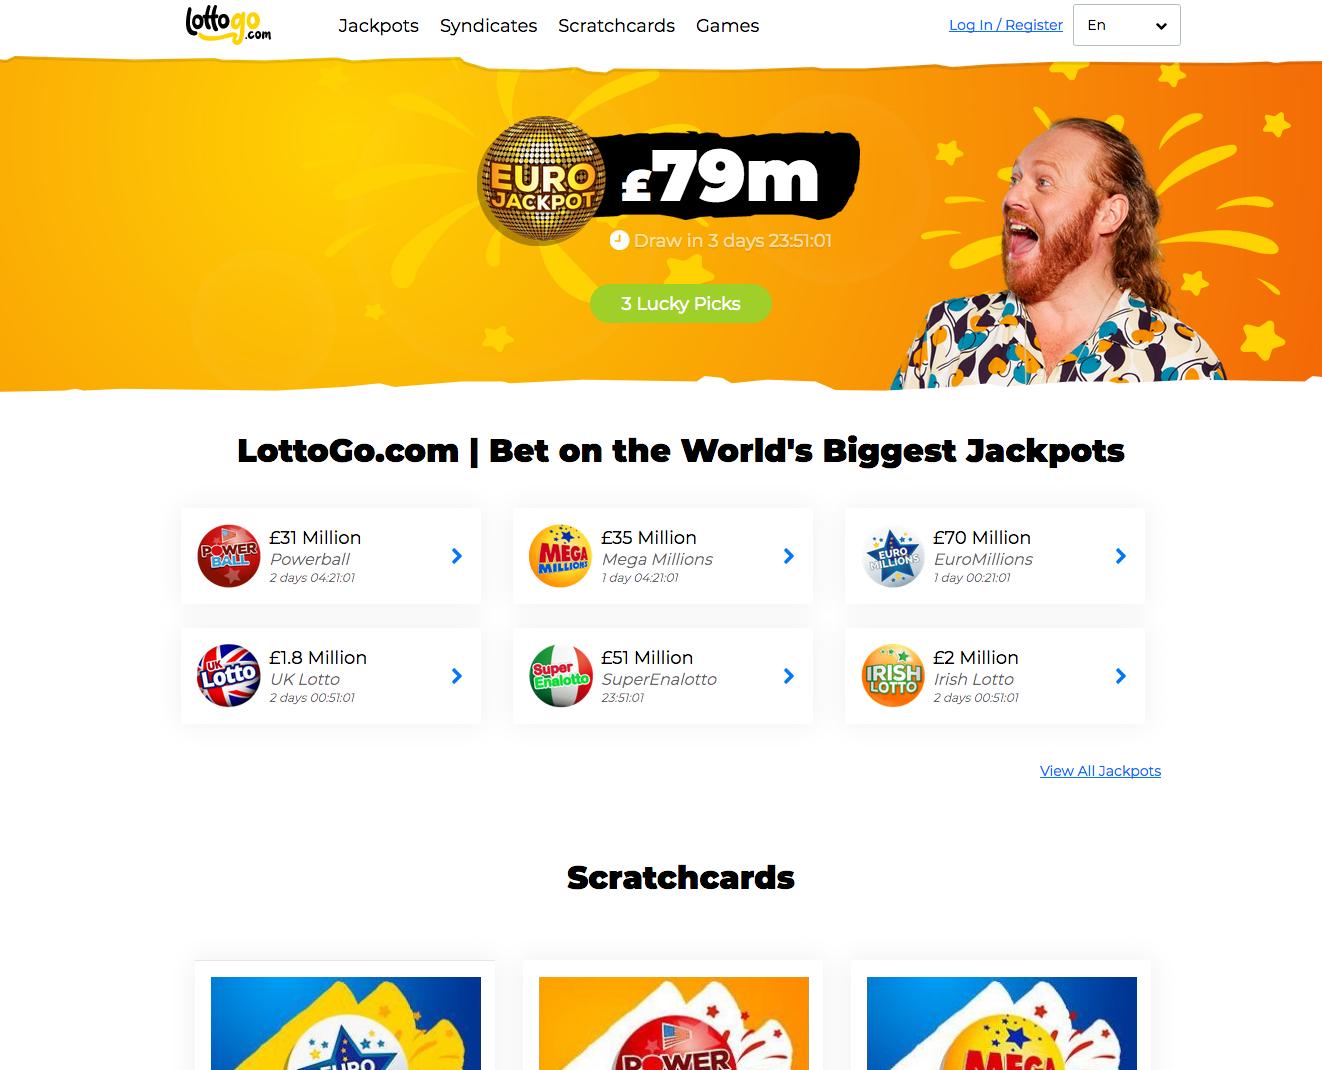 LottoGo screenshots